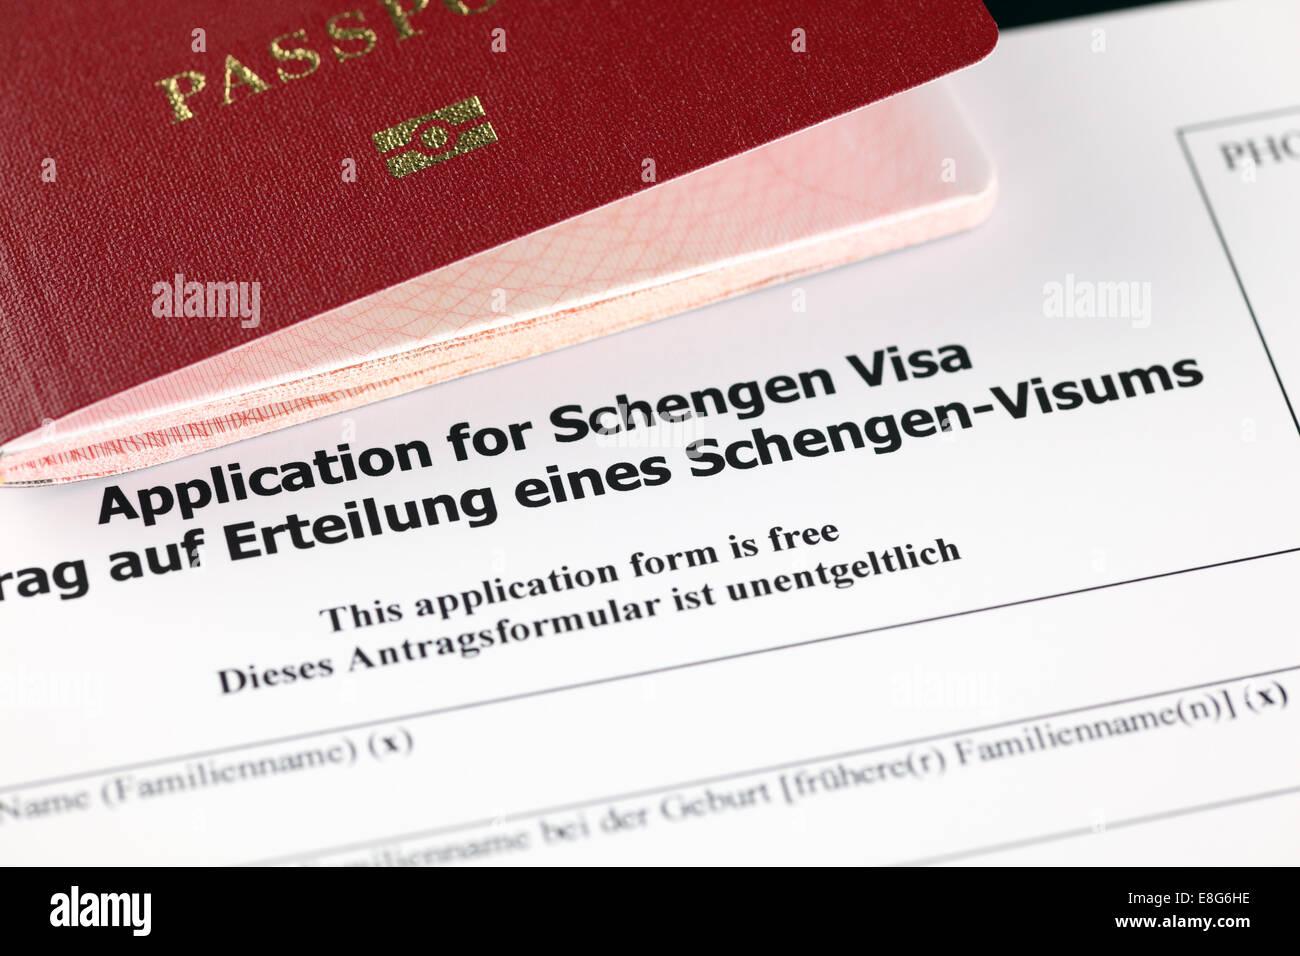 schengen transit visa application form